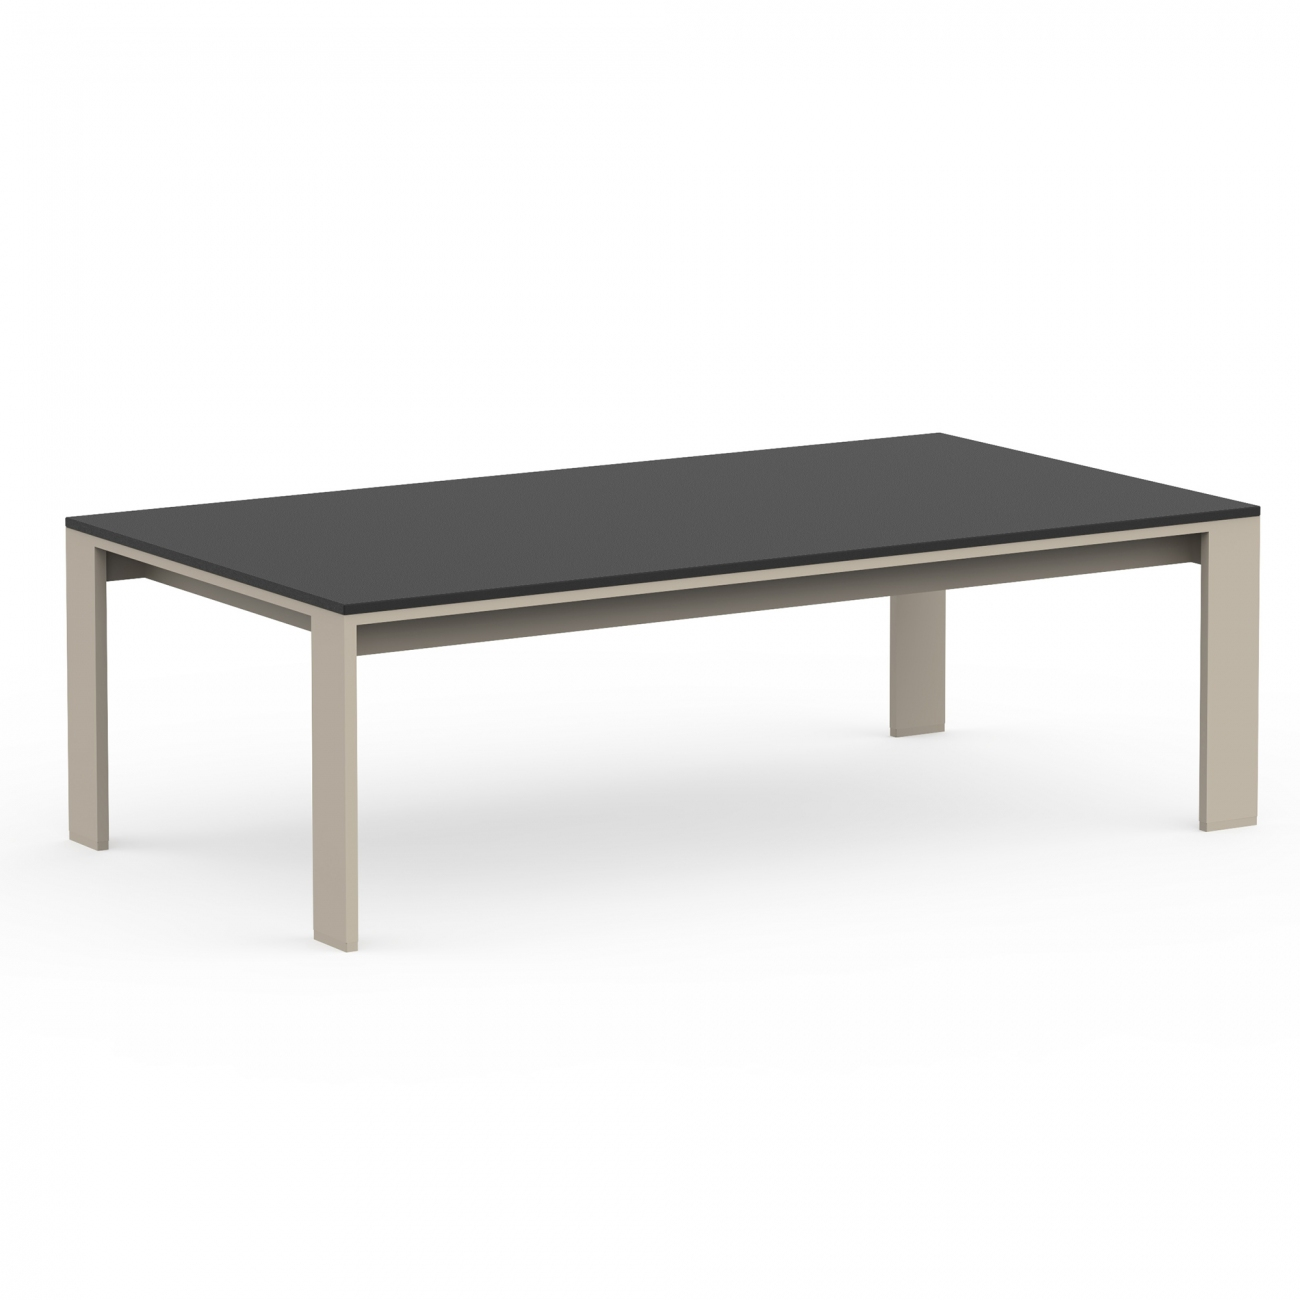 Gandia Blasco Solanas Side Table